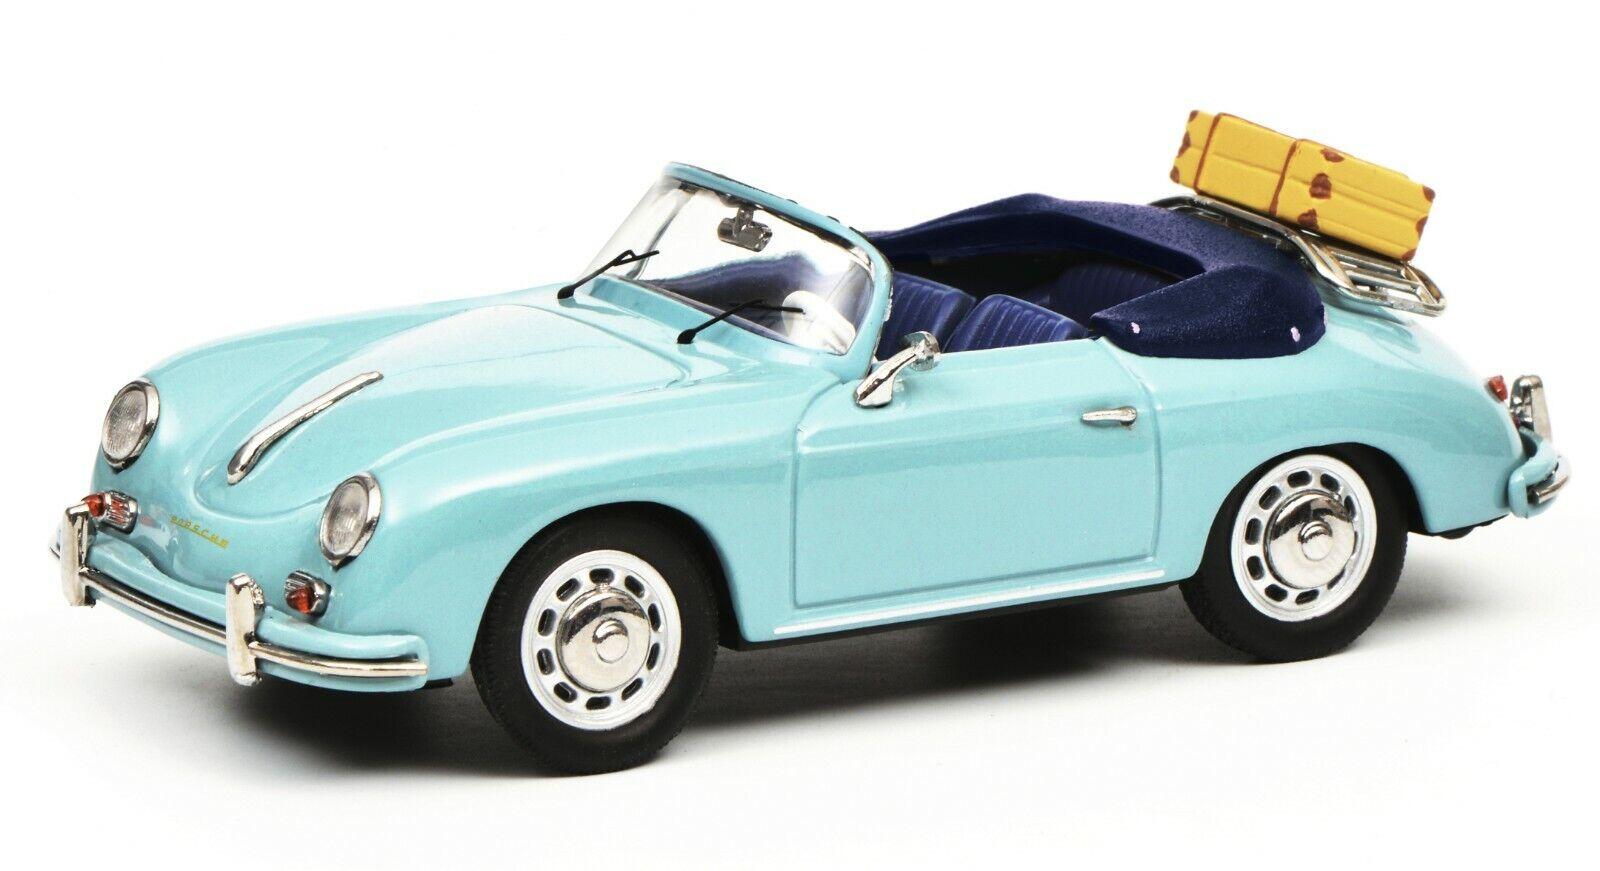 Schuco 1 43 Porsche 356 A Cabriolet travel Blau 450258400